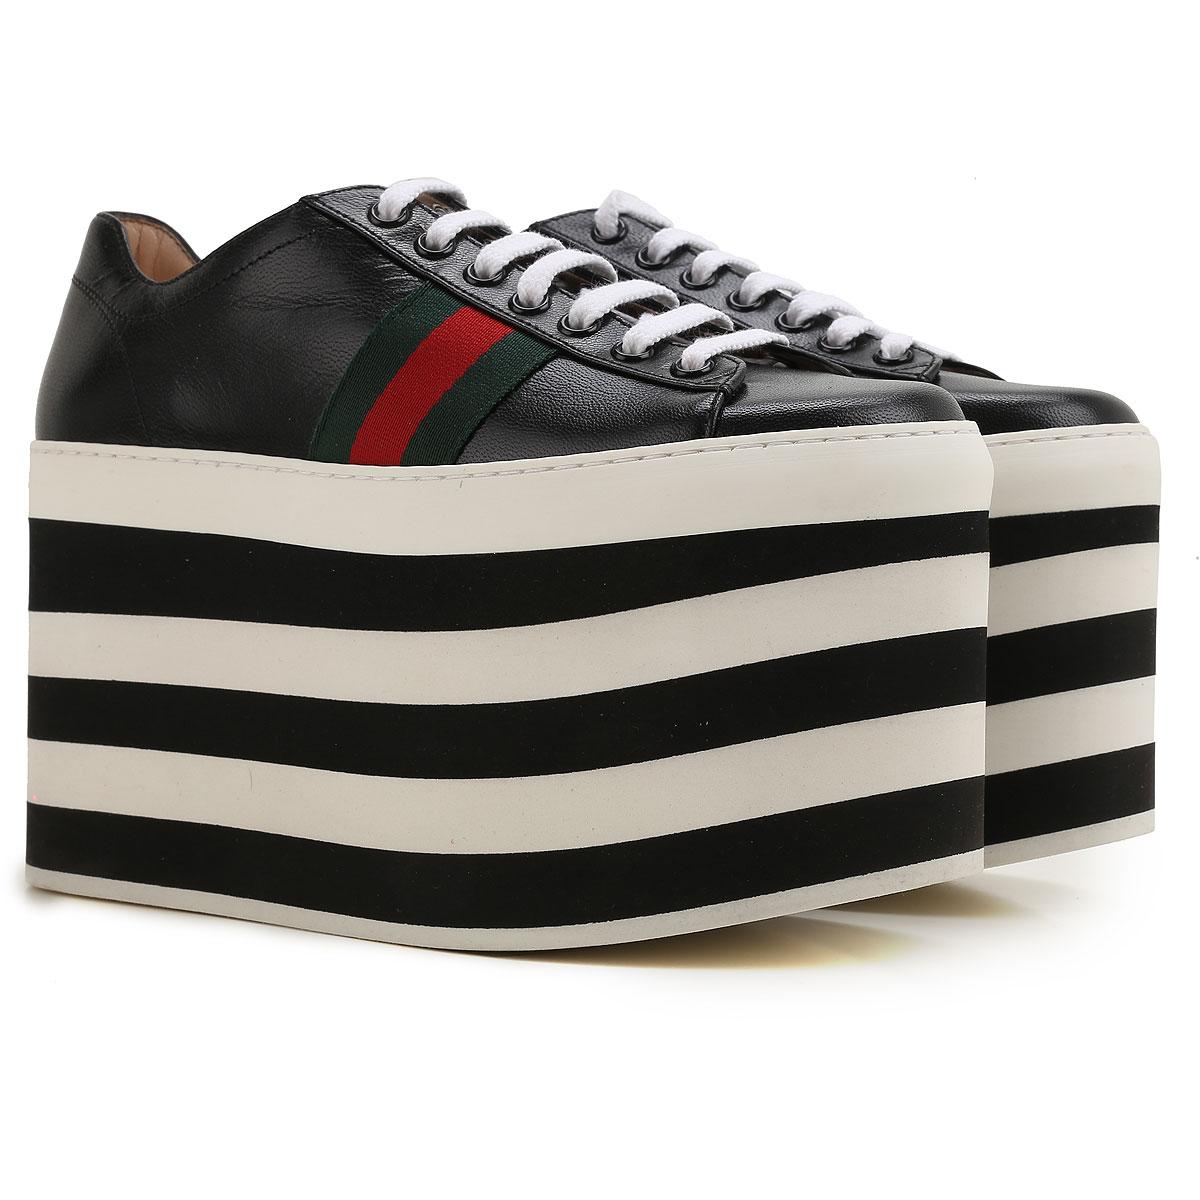 Gucci Outlet Shoes Online